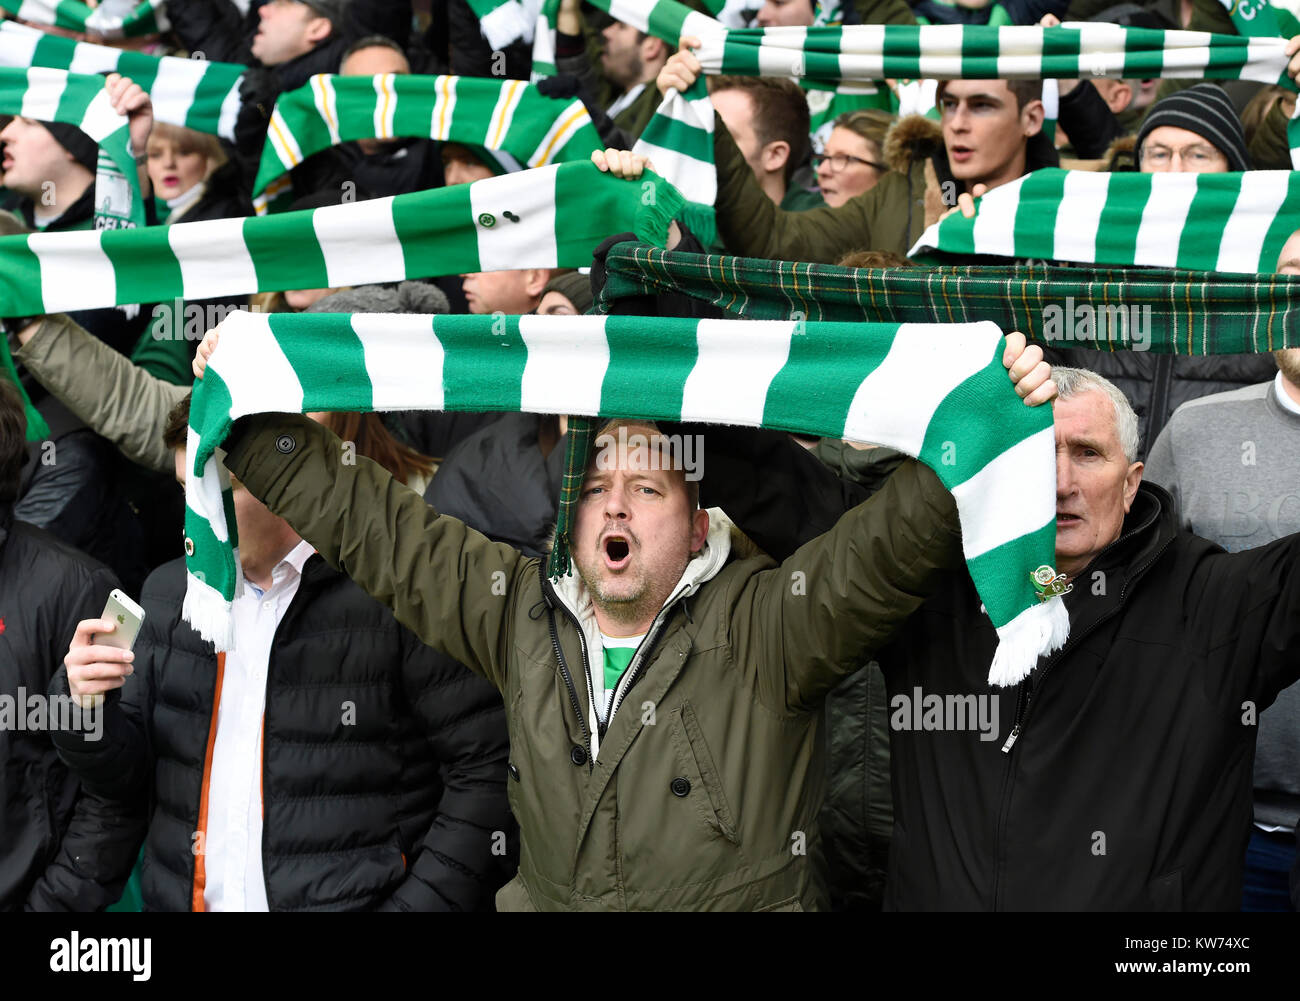 Celtic fans dating site